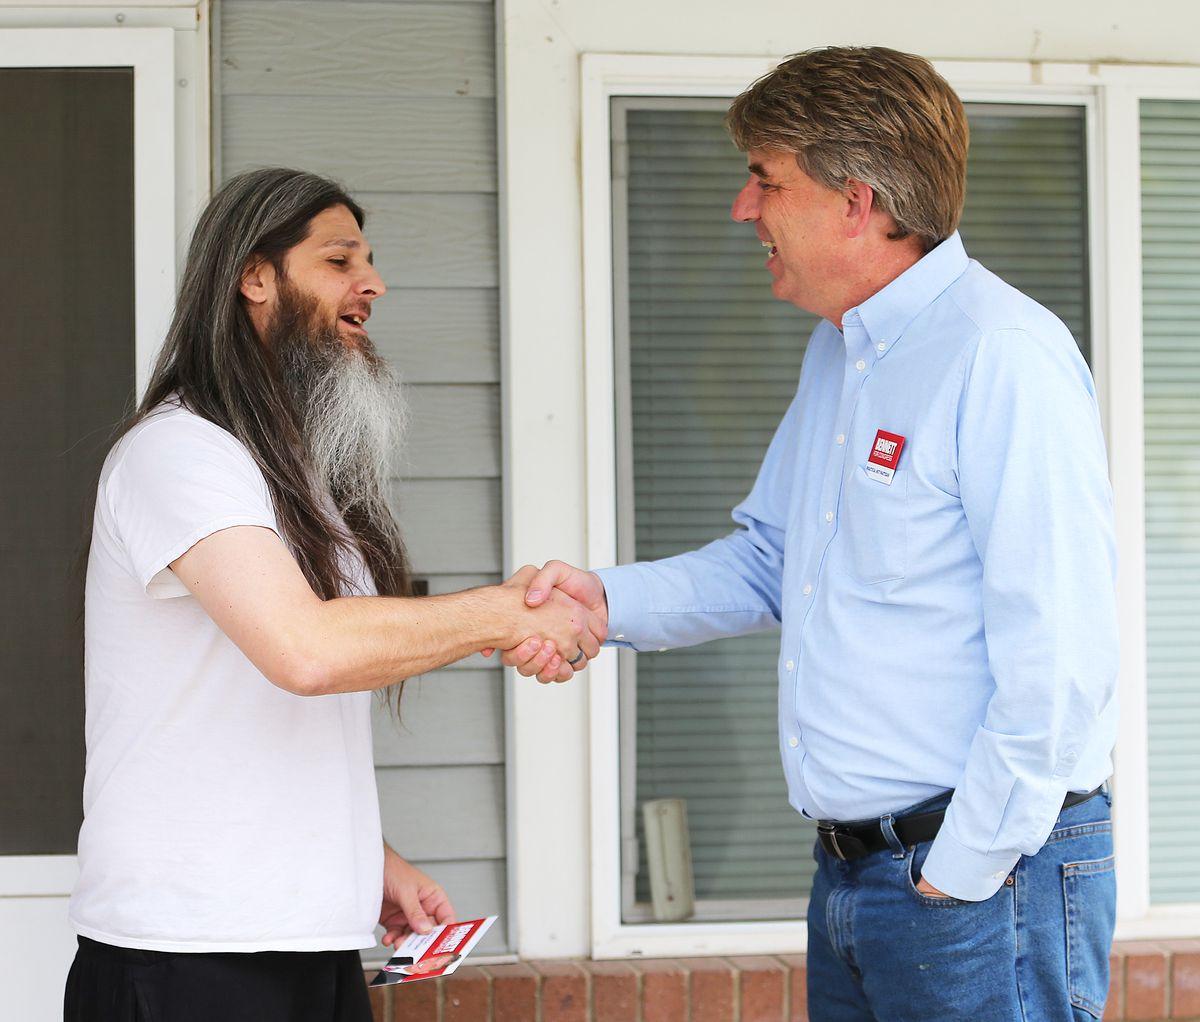 United Utah Party candidate Jim Bennett.